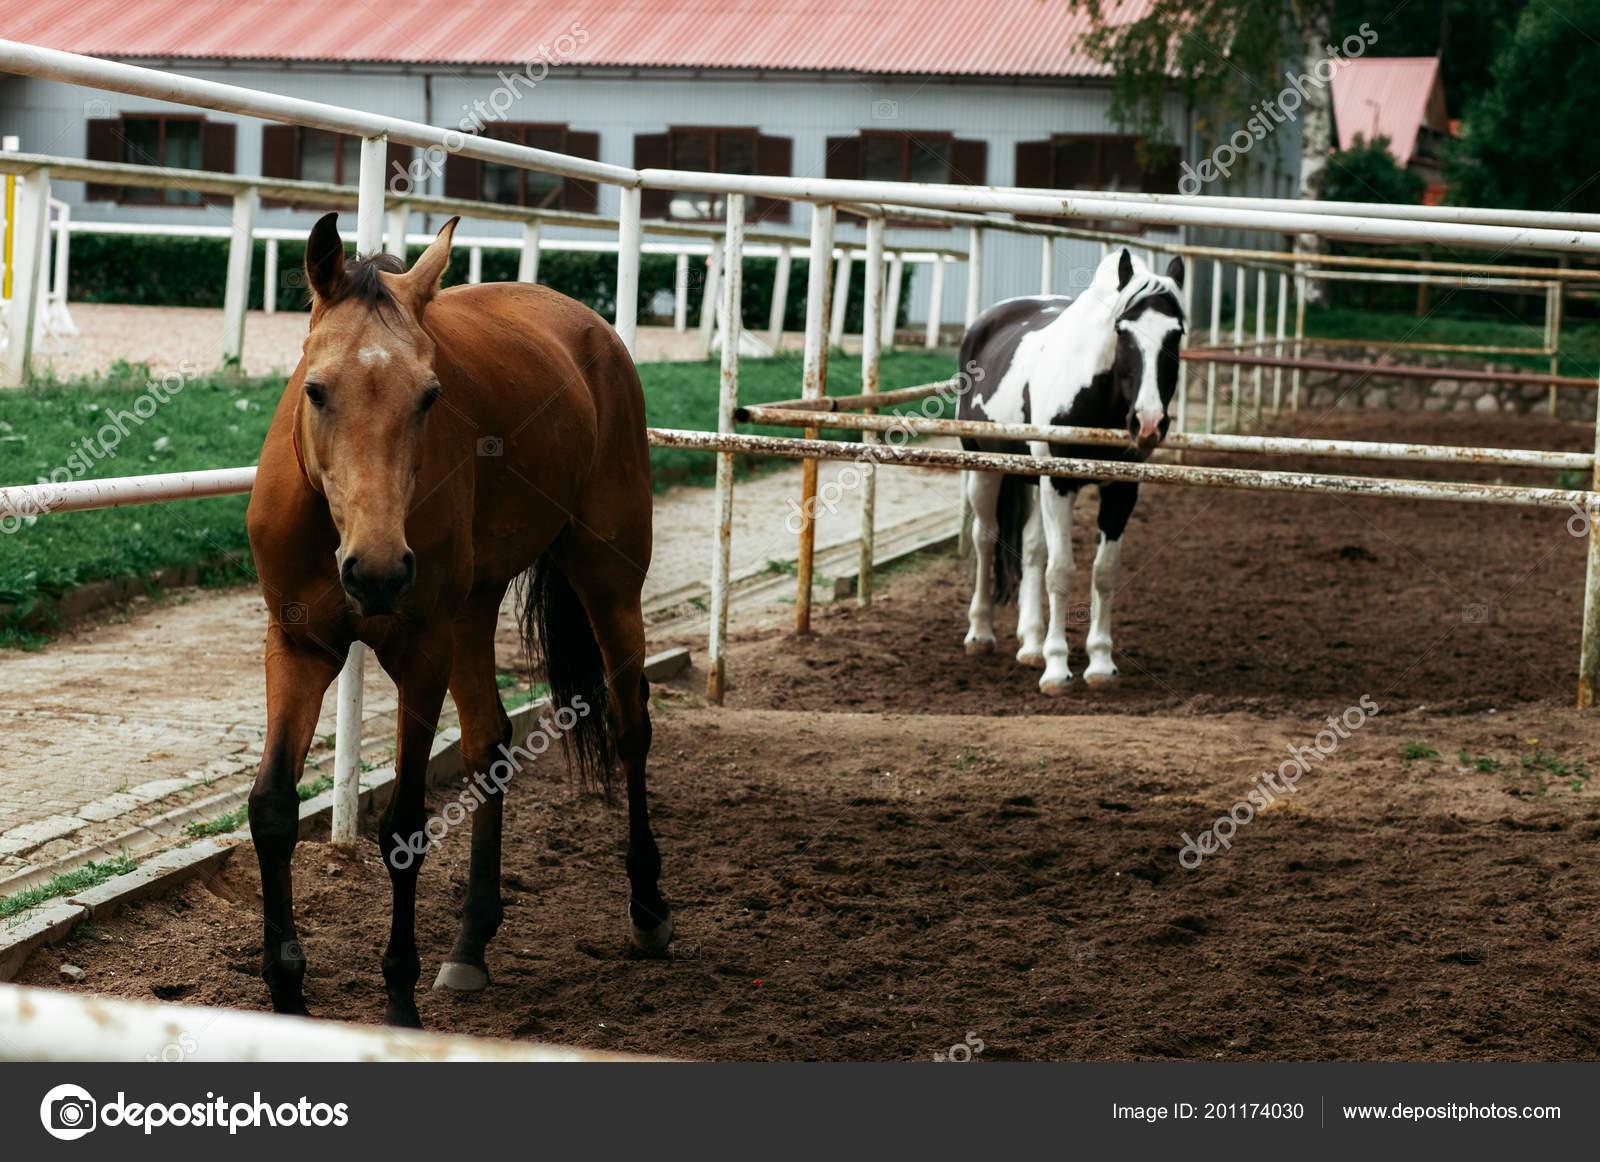 Beautiful Horses Animals Pasture Stables Horseback Riding Stock Photo C Vitizh 201174030